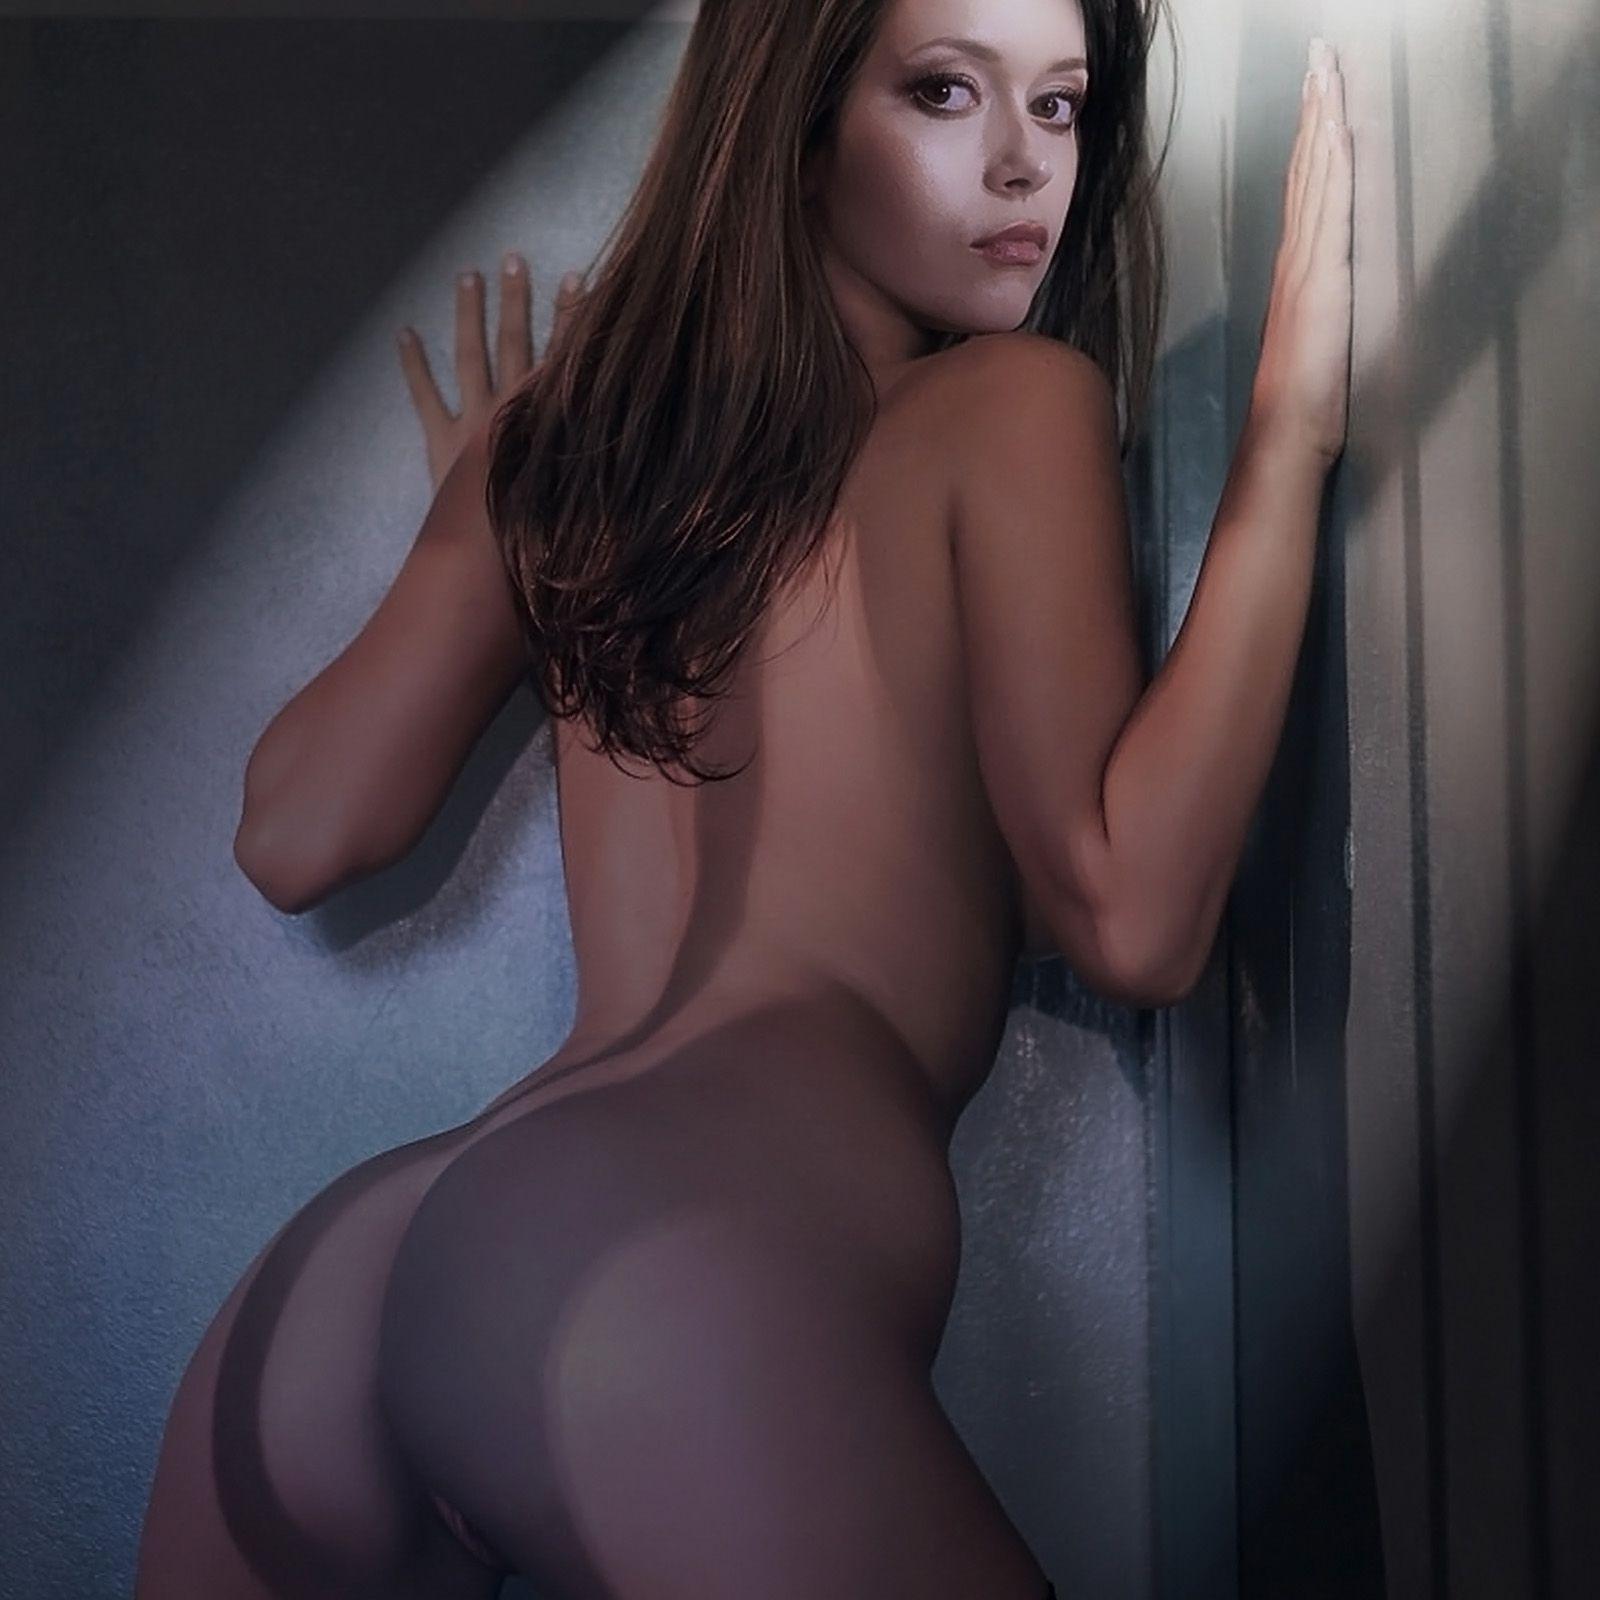 Naked Summer Glau 51